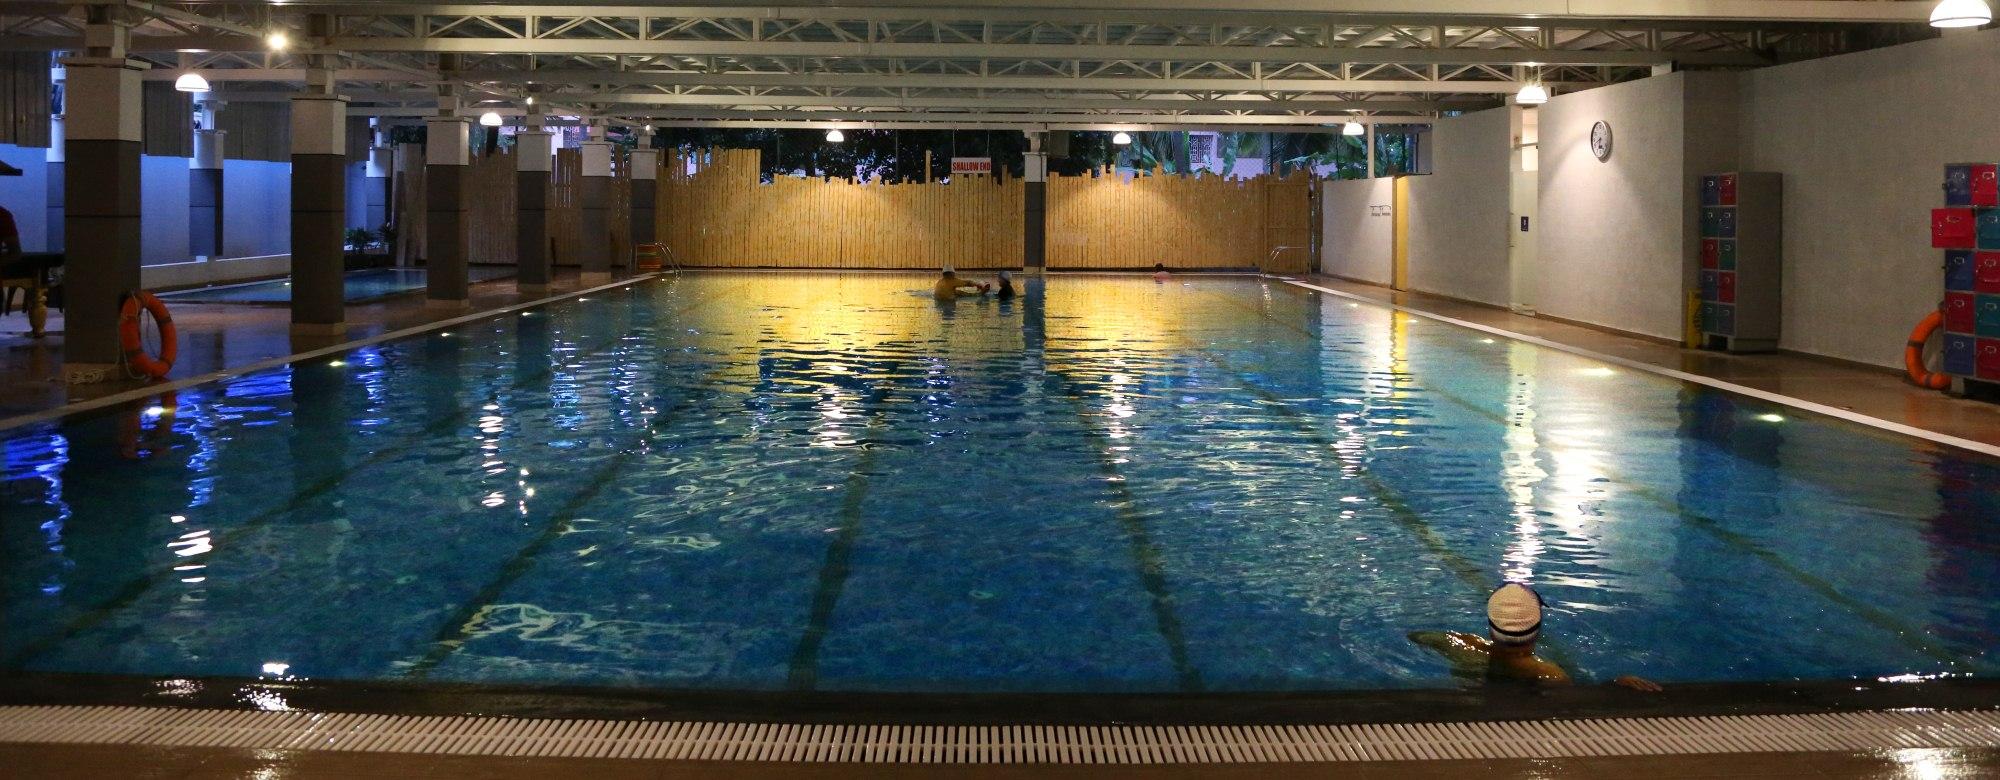 Agonadmin Uploads Photos Thumbs Mob 25 Meters Semi Indoor Swimming Pool